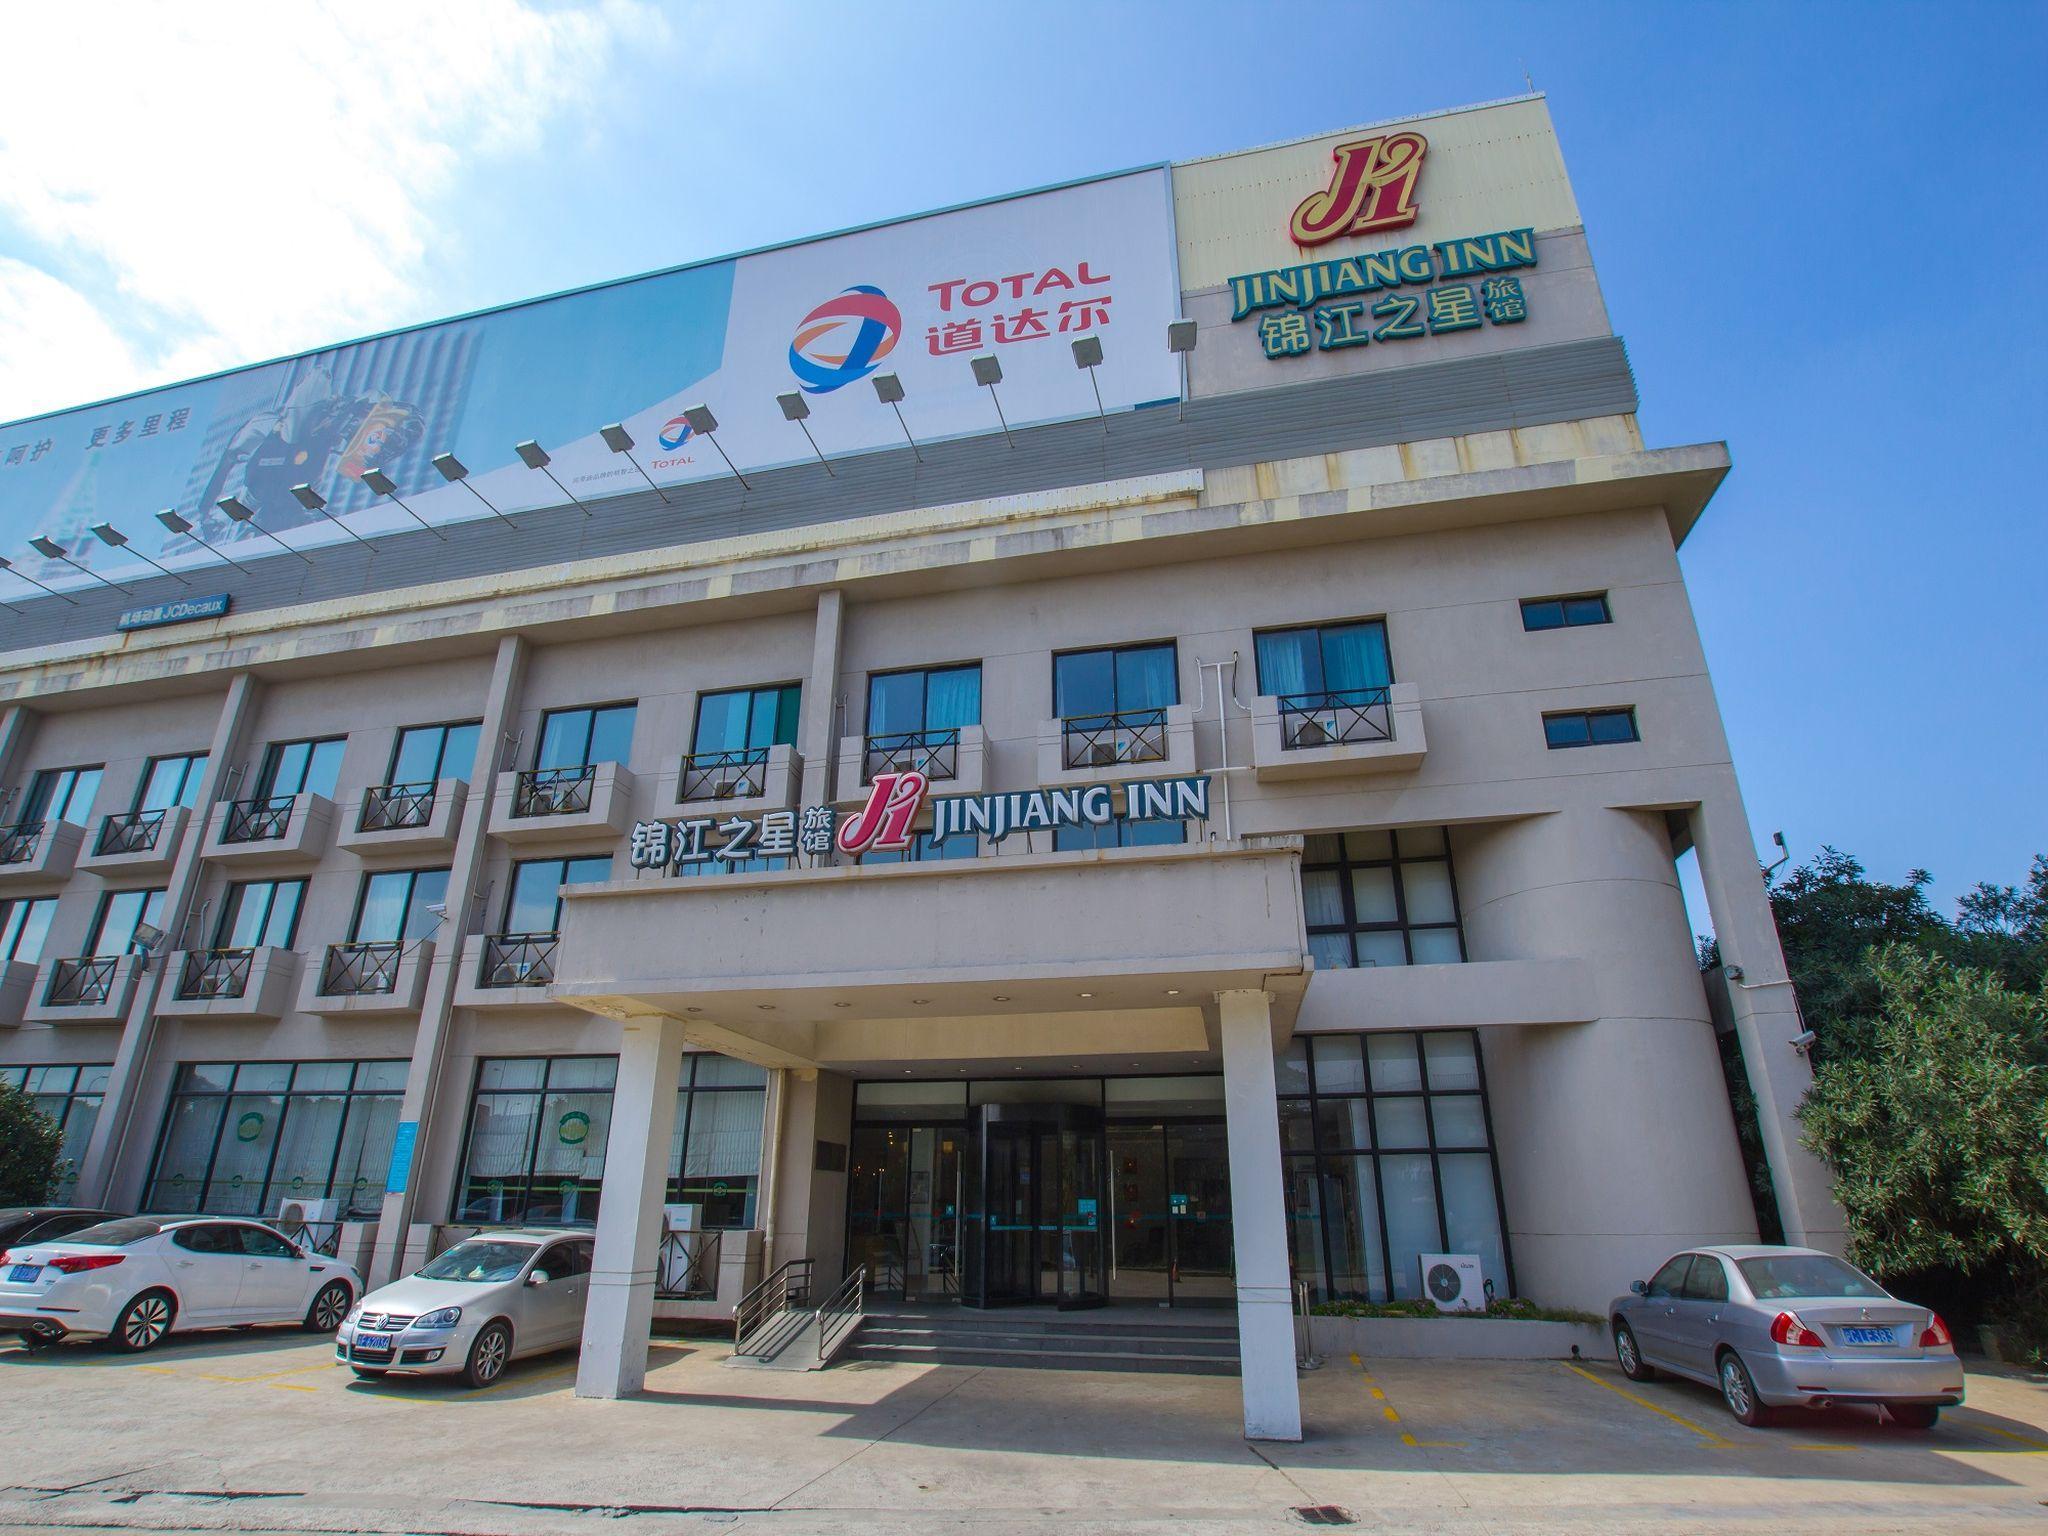 Jinjiang Inns Shanghai Pudong Airport